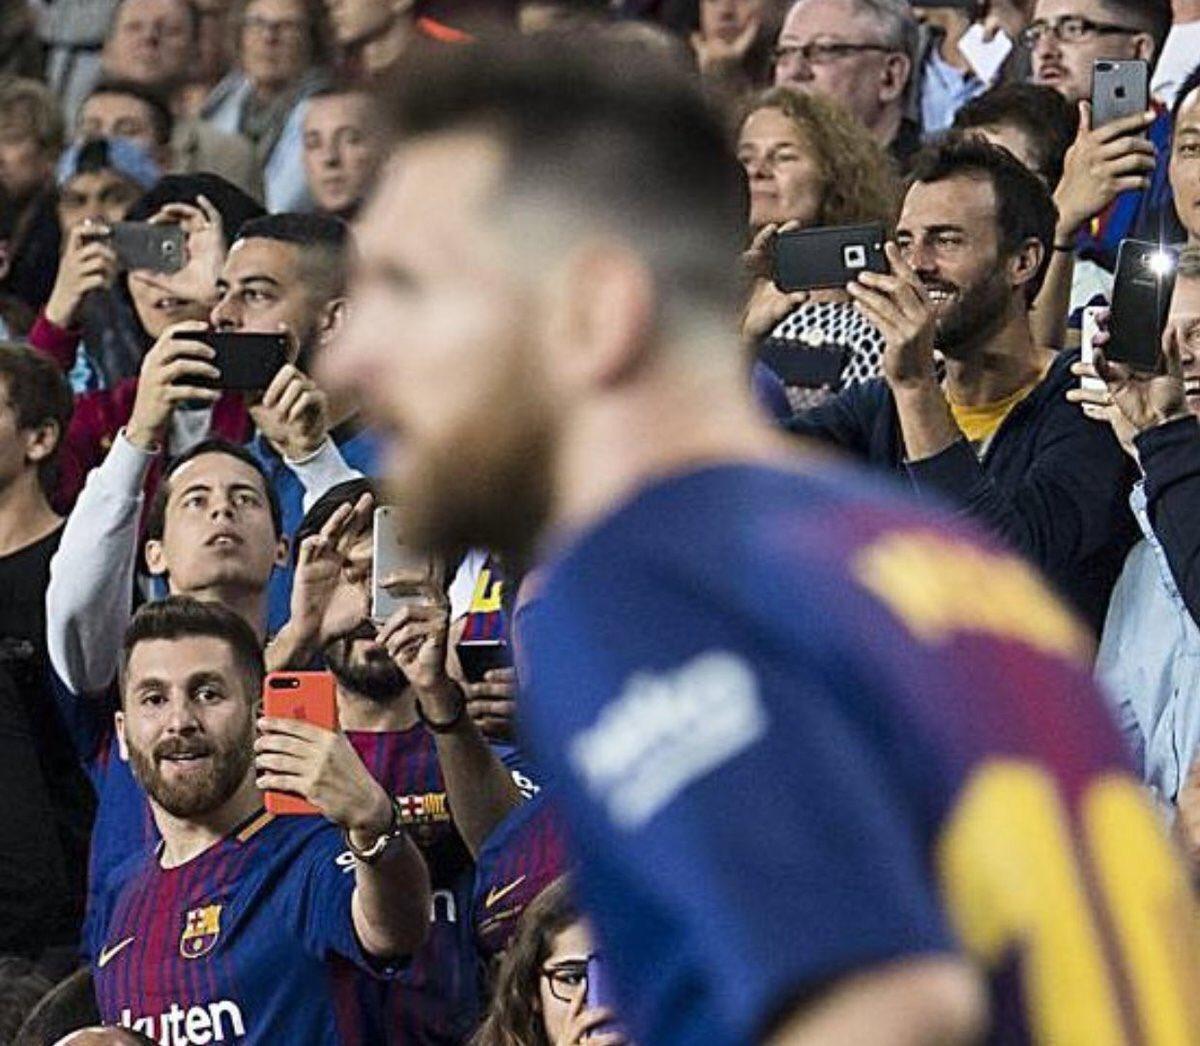 ¿Cuánto mide Reza Parastesh (doble de Messi)? - Real height DMsuPWDWsAI0pH9?format=jpg